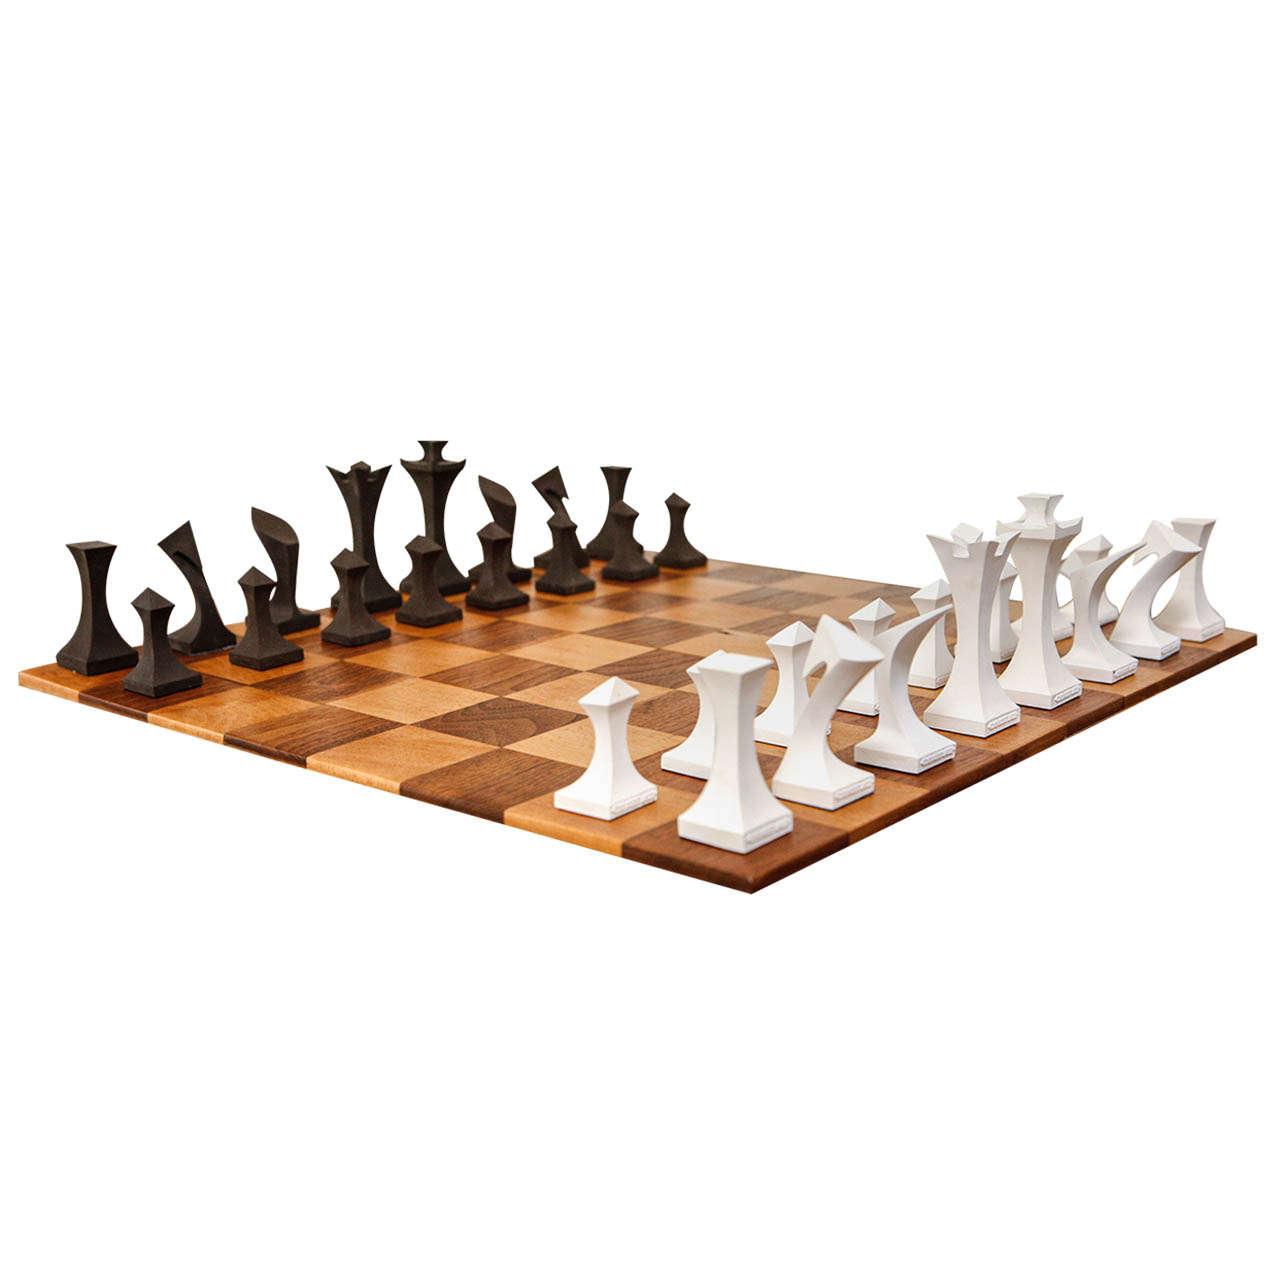 Modern Chess Set By Robert Lander At 1stdibs